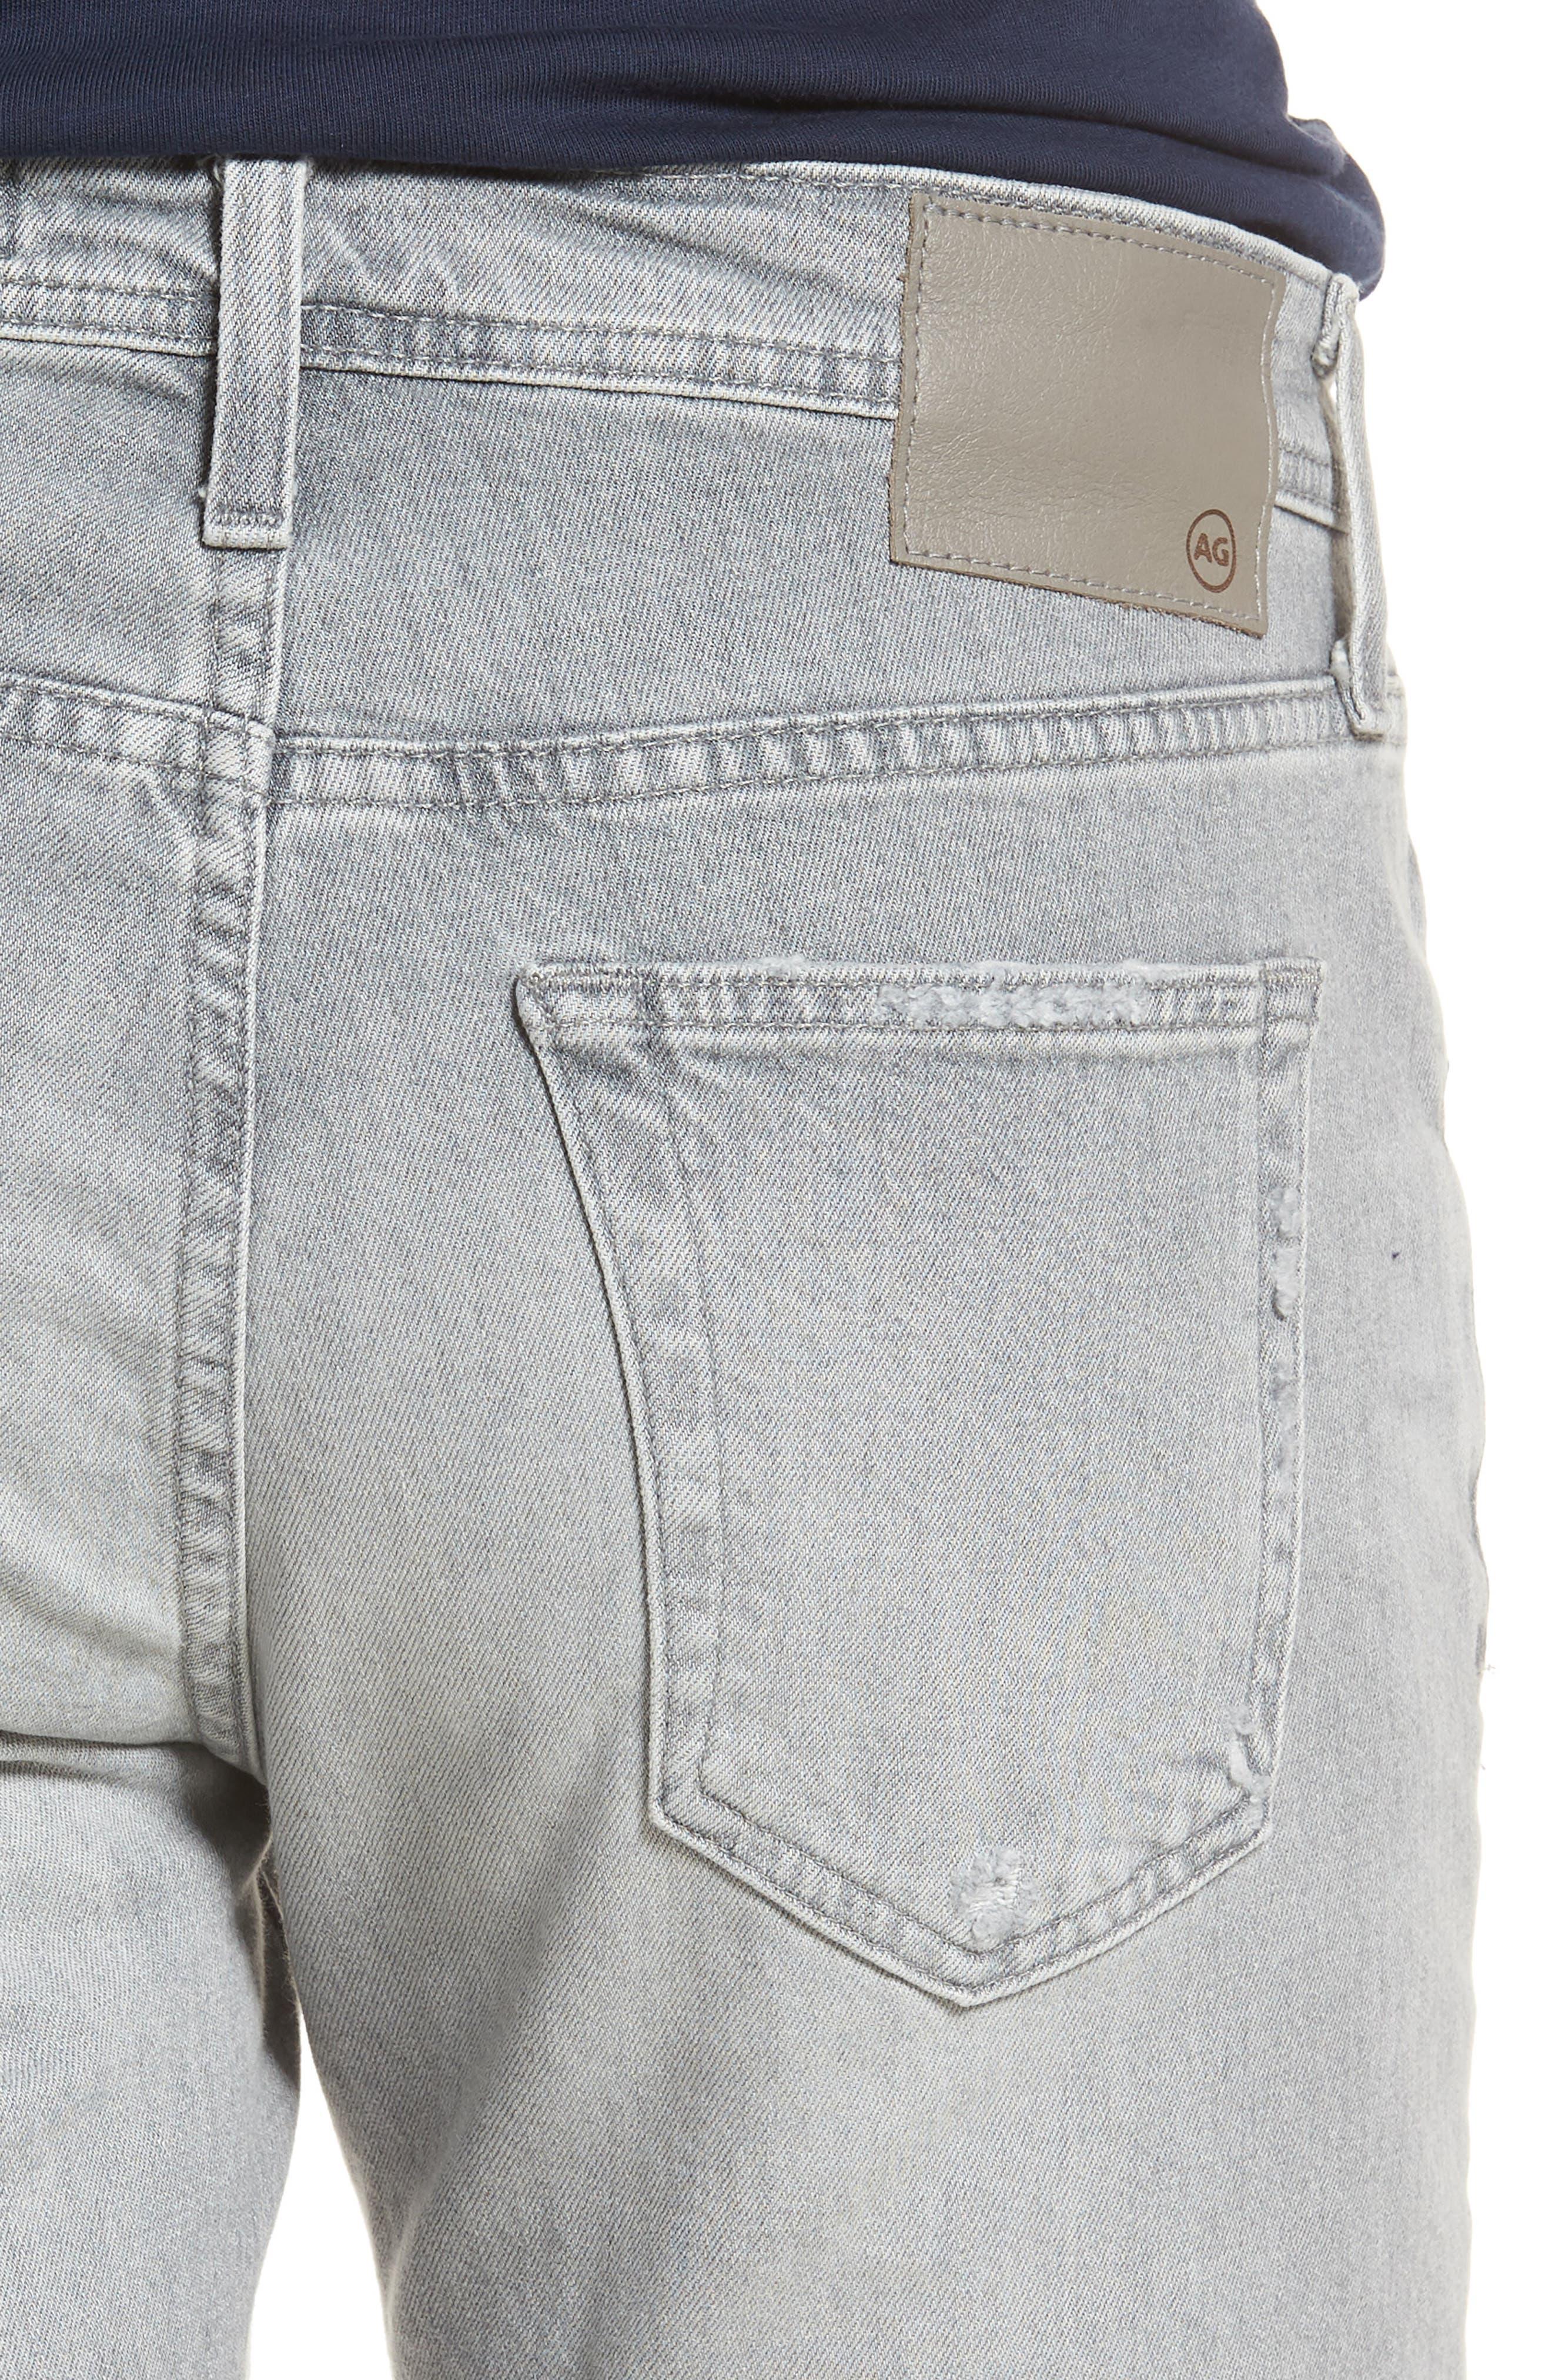 Tellis Slim Fit Jeans,                             Alternate thumbnail 4, color,                             21 Years Sketch